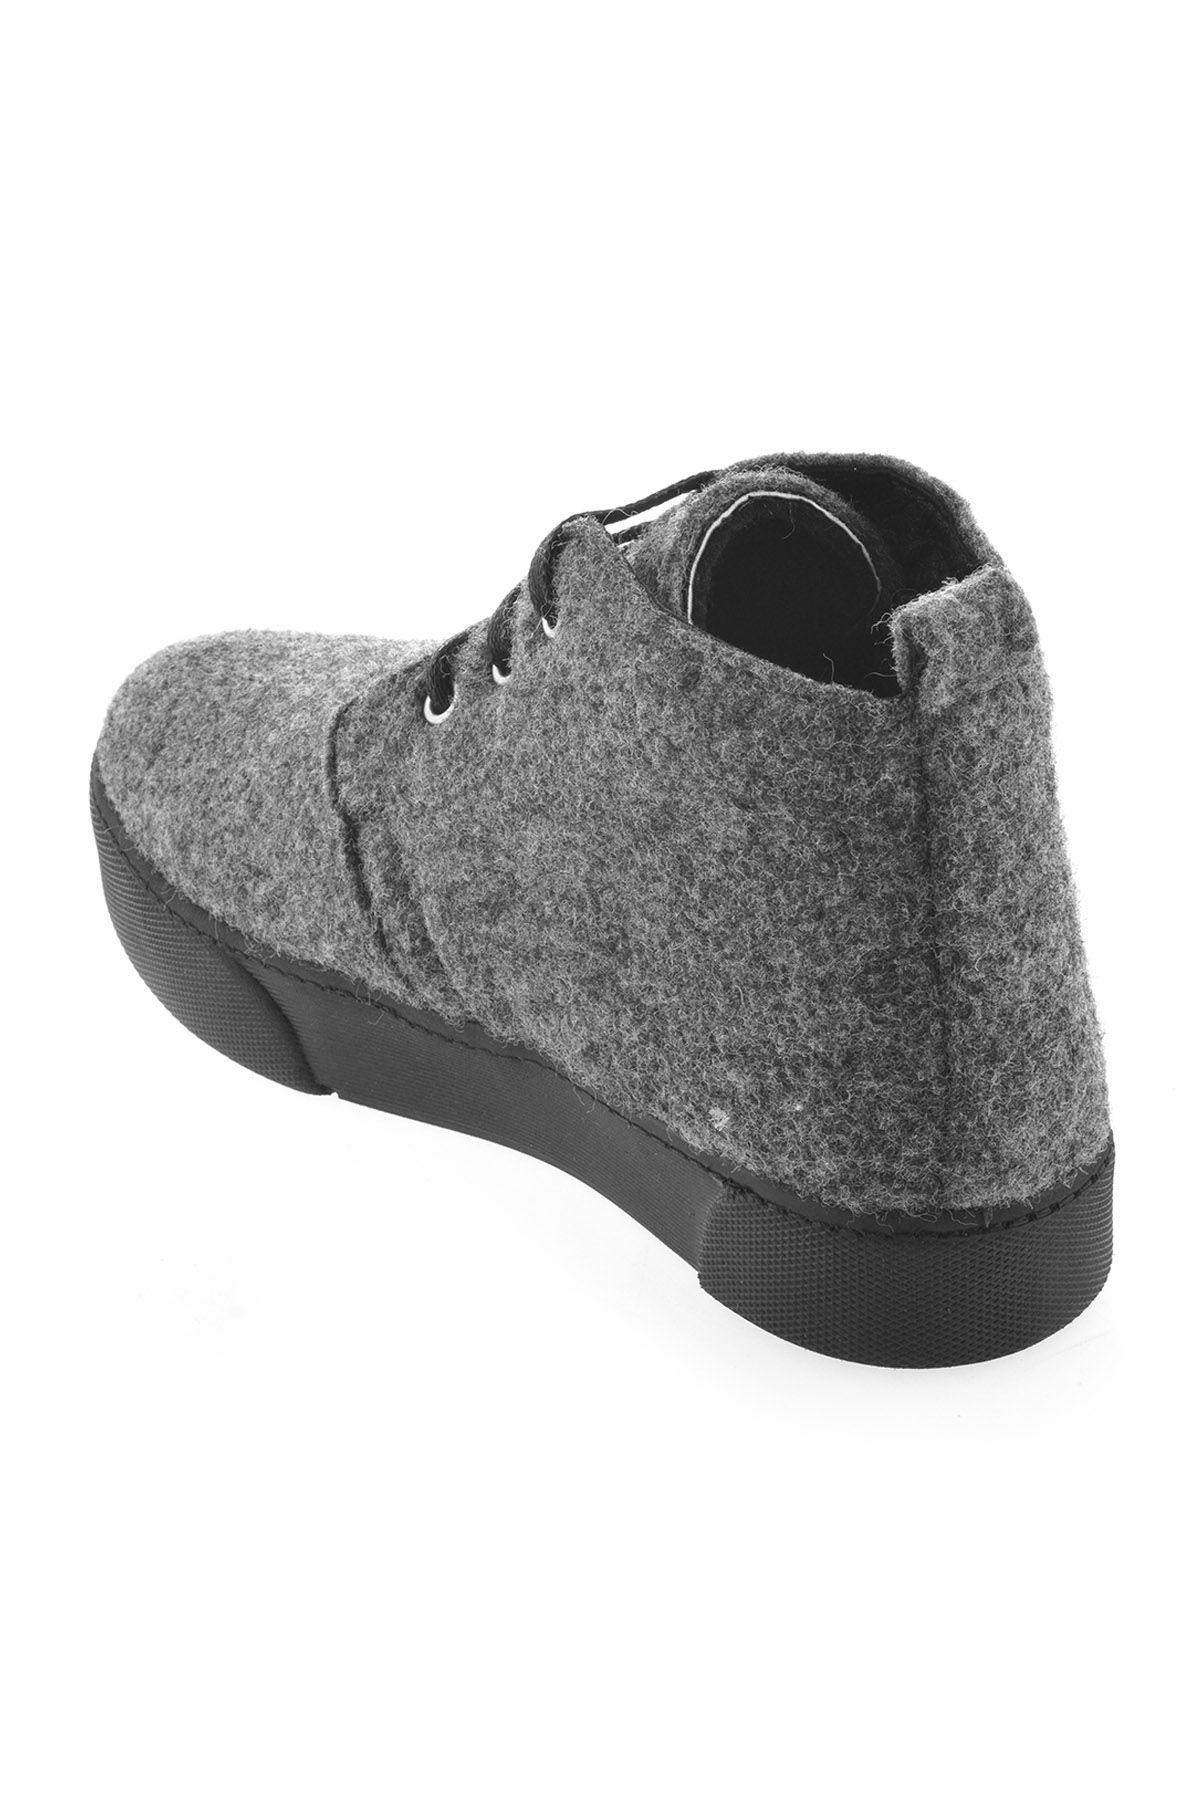 Art Goya Hakiki Kaşmir Bayan Sneaker 659502 Açık Gri